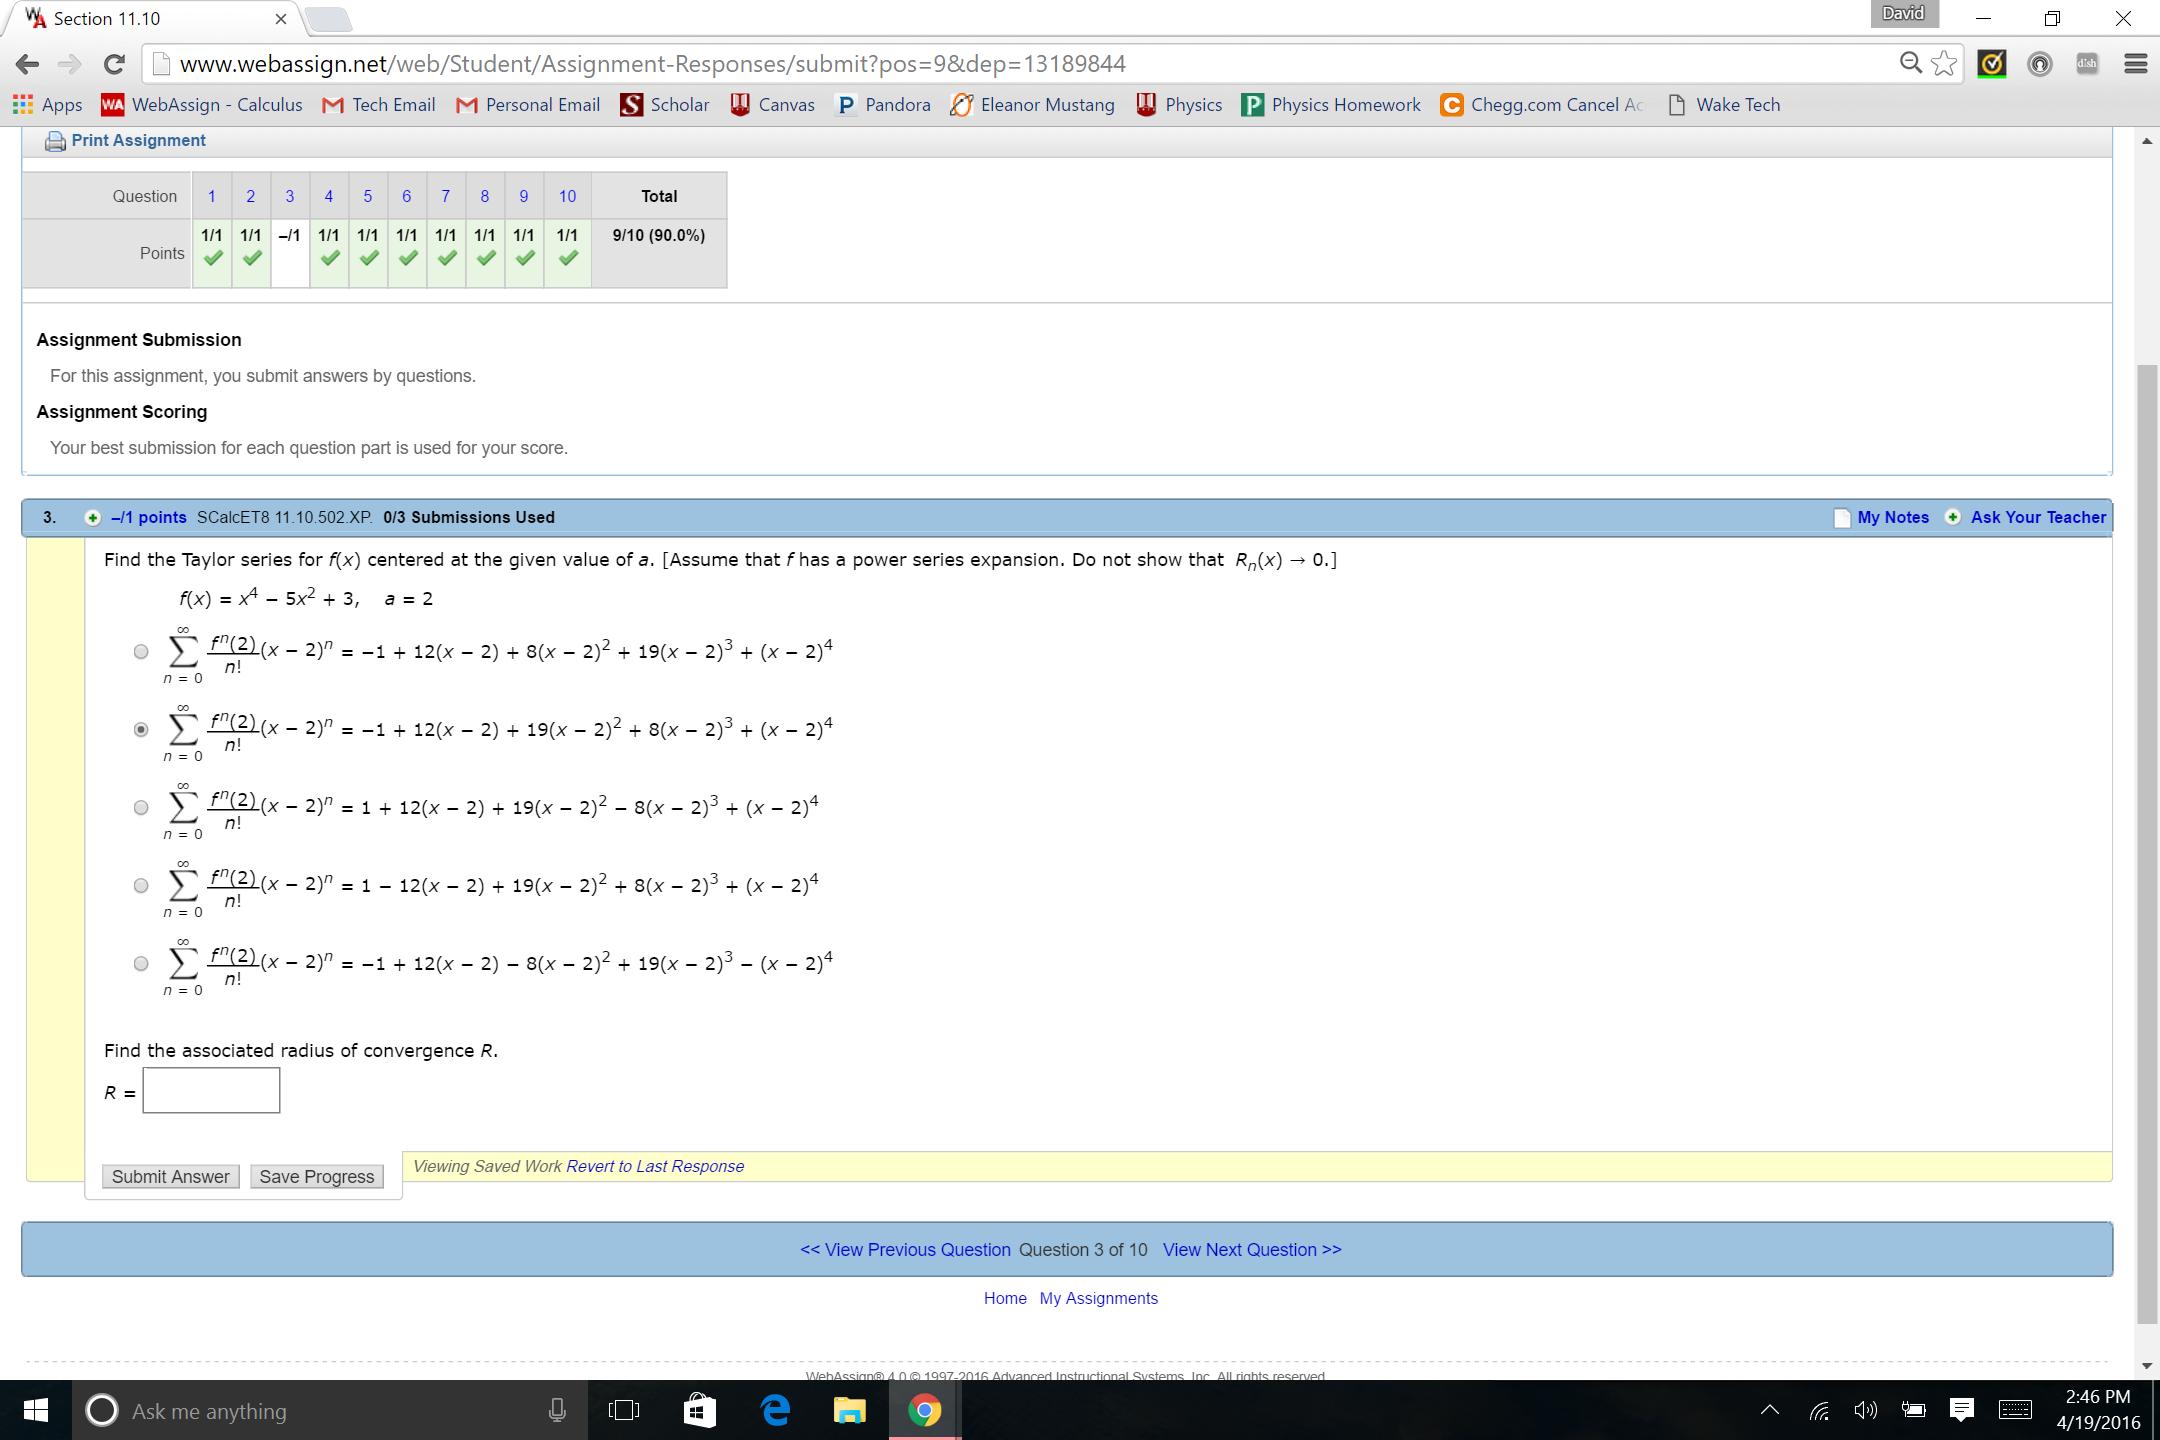 Solved: Section 11 10 David ←÷ C ーwww webassign net/web/S